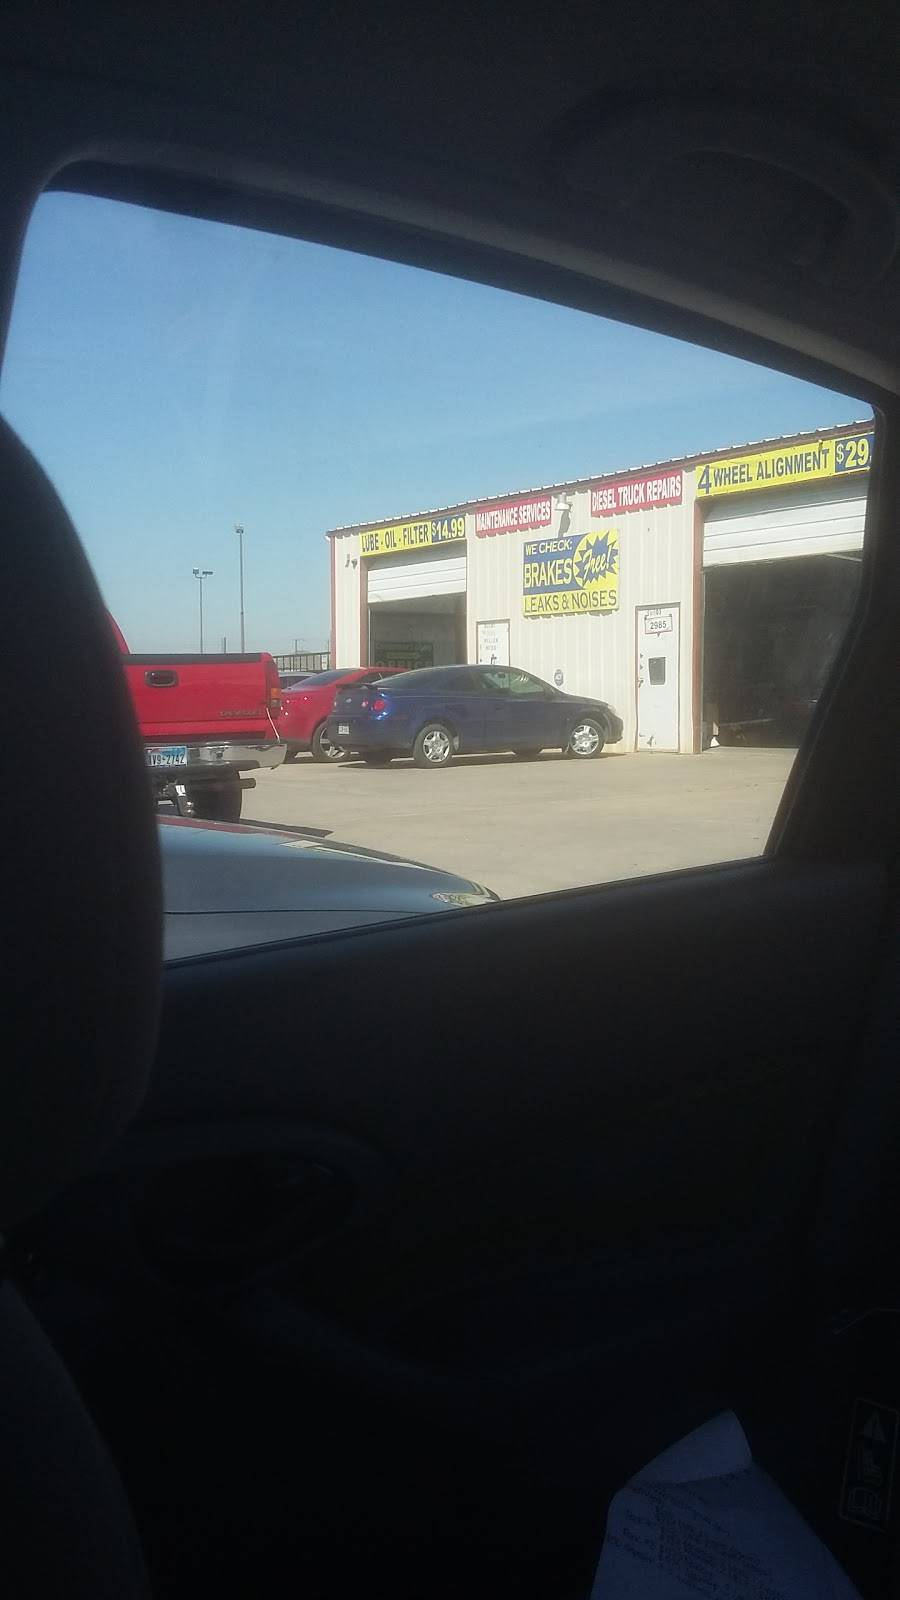 Alliance Dyno & Auto Services - car repair  | Photo 3 of 8 | Address: 2985 Keller Hicks Rd, Keller, TX 76244, USA | Phone: (817) 431-3150